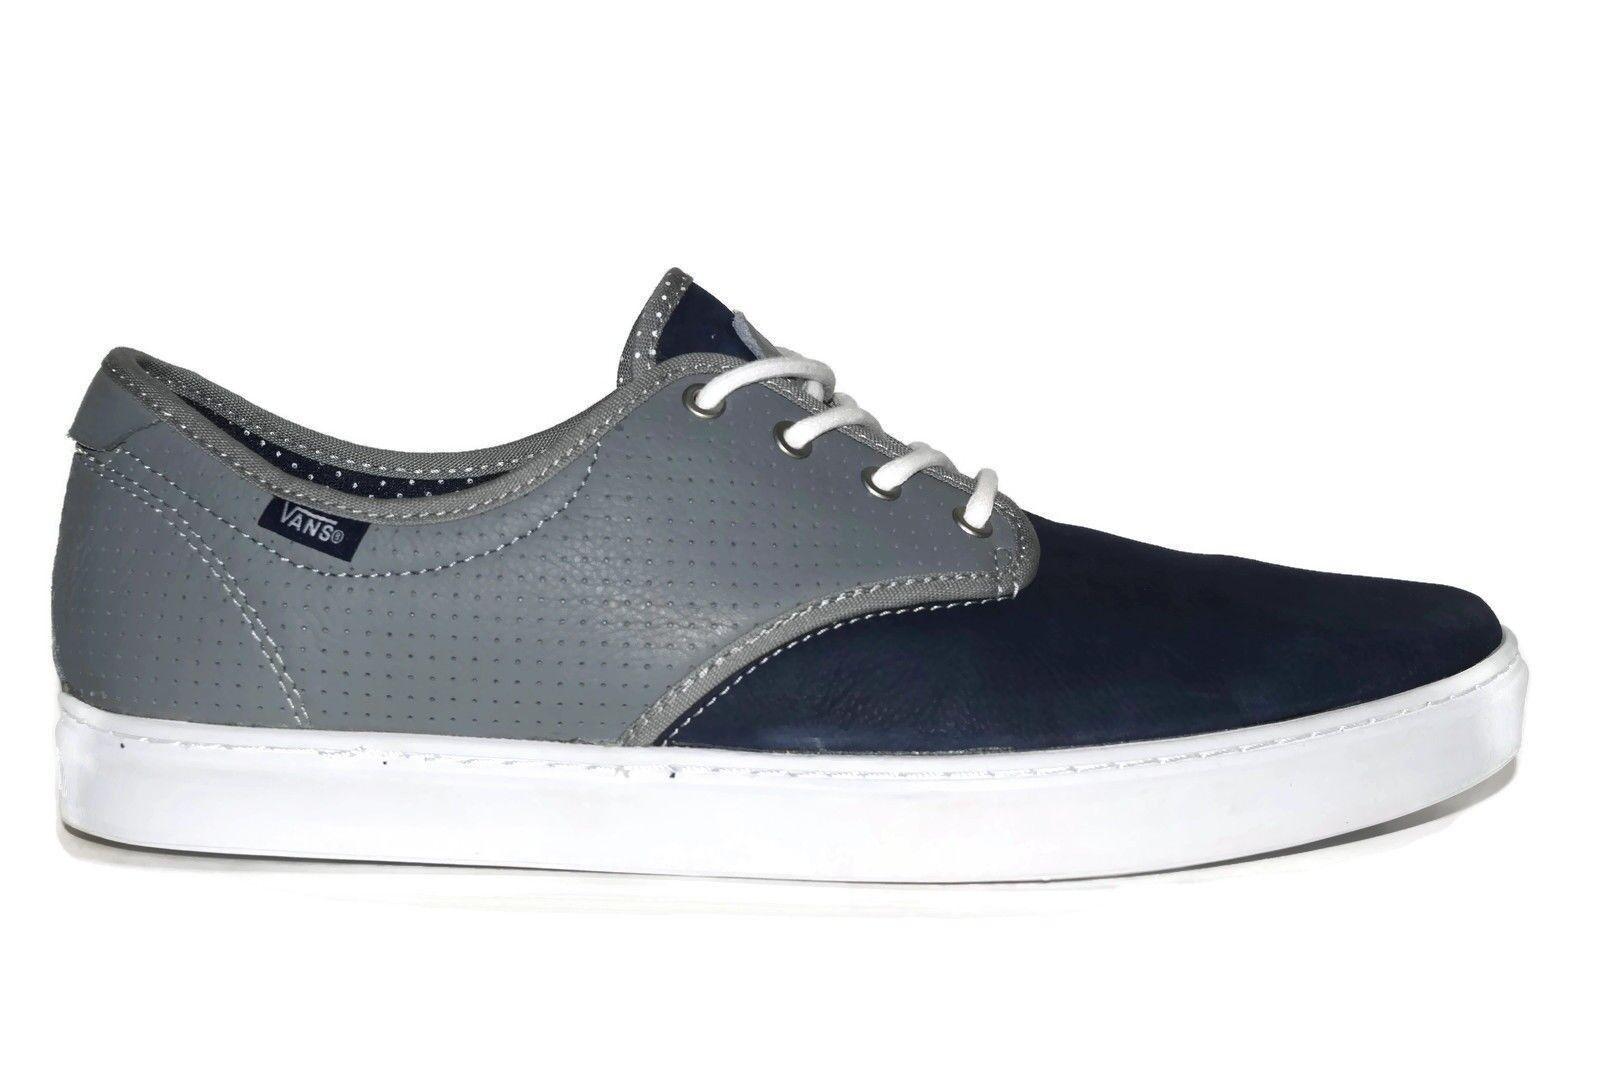 Vans Ludlow (Dots) Navy/Grey/Whit<wbr/>e OTW Skate Casual Classic MEN&#039;S 6.5 WOMEN&#039;S 8